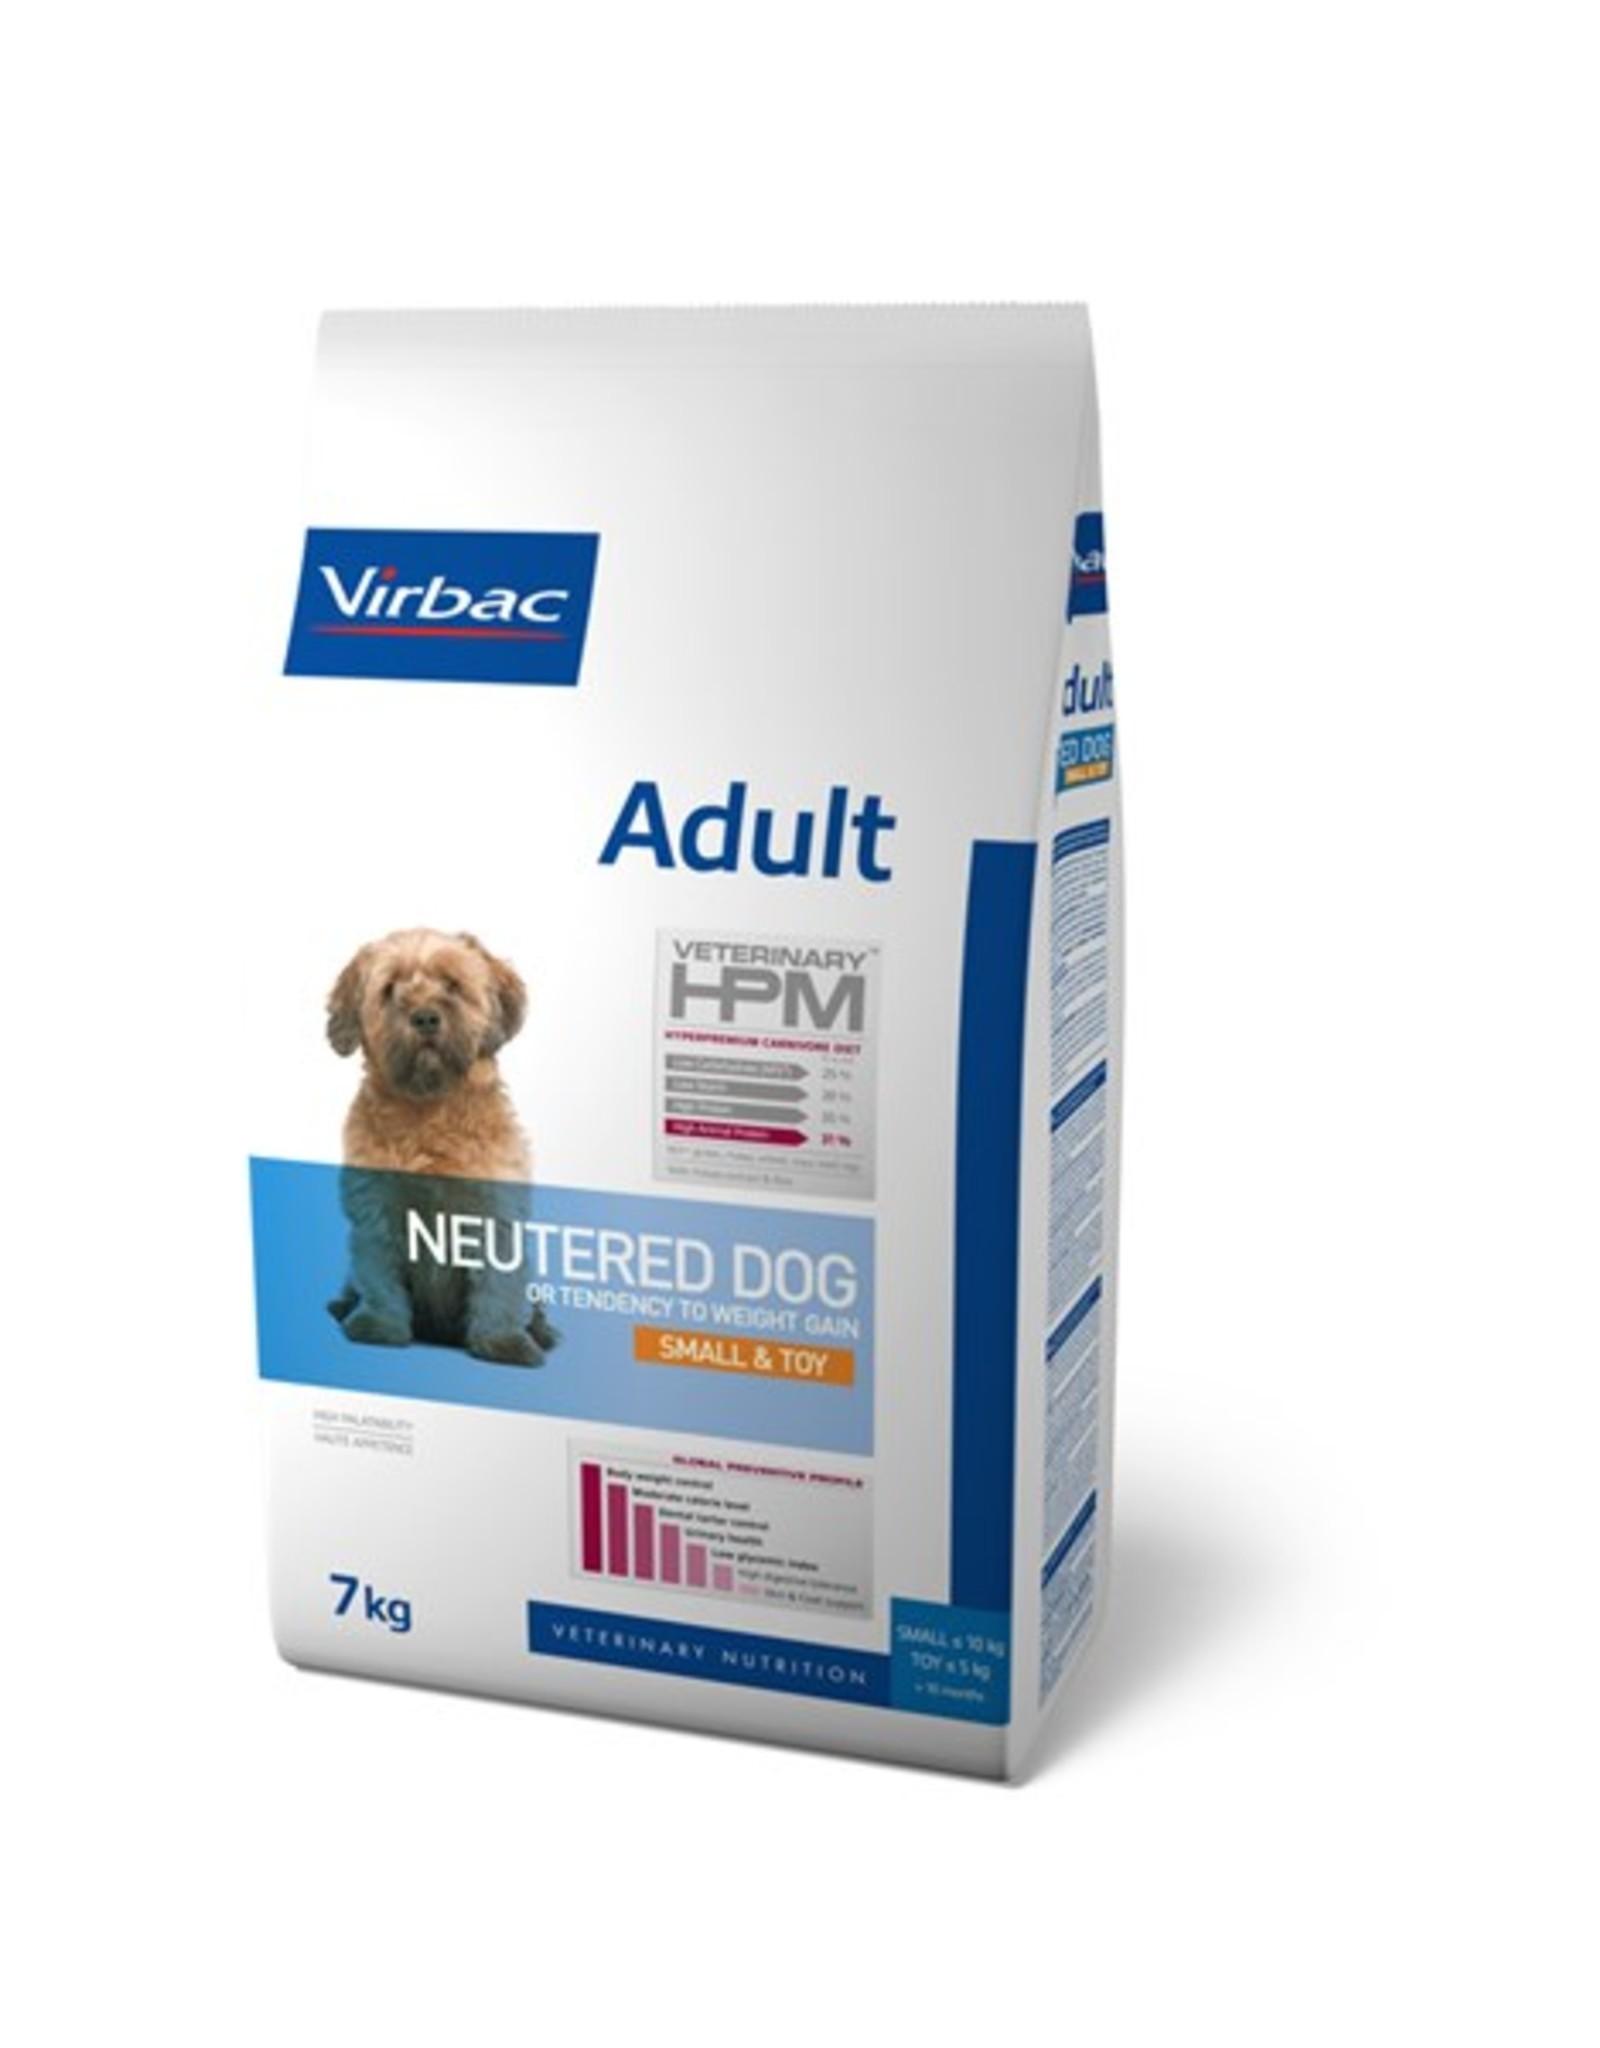 Virbac Virbac Hpm Dog Neutered Adult Small Breed/toy 7kg